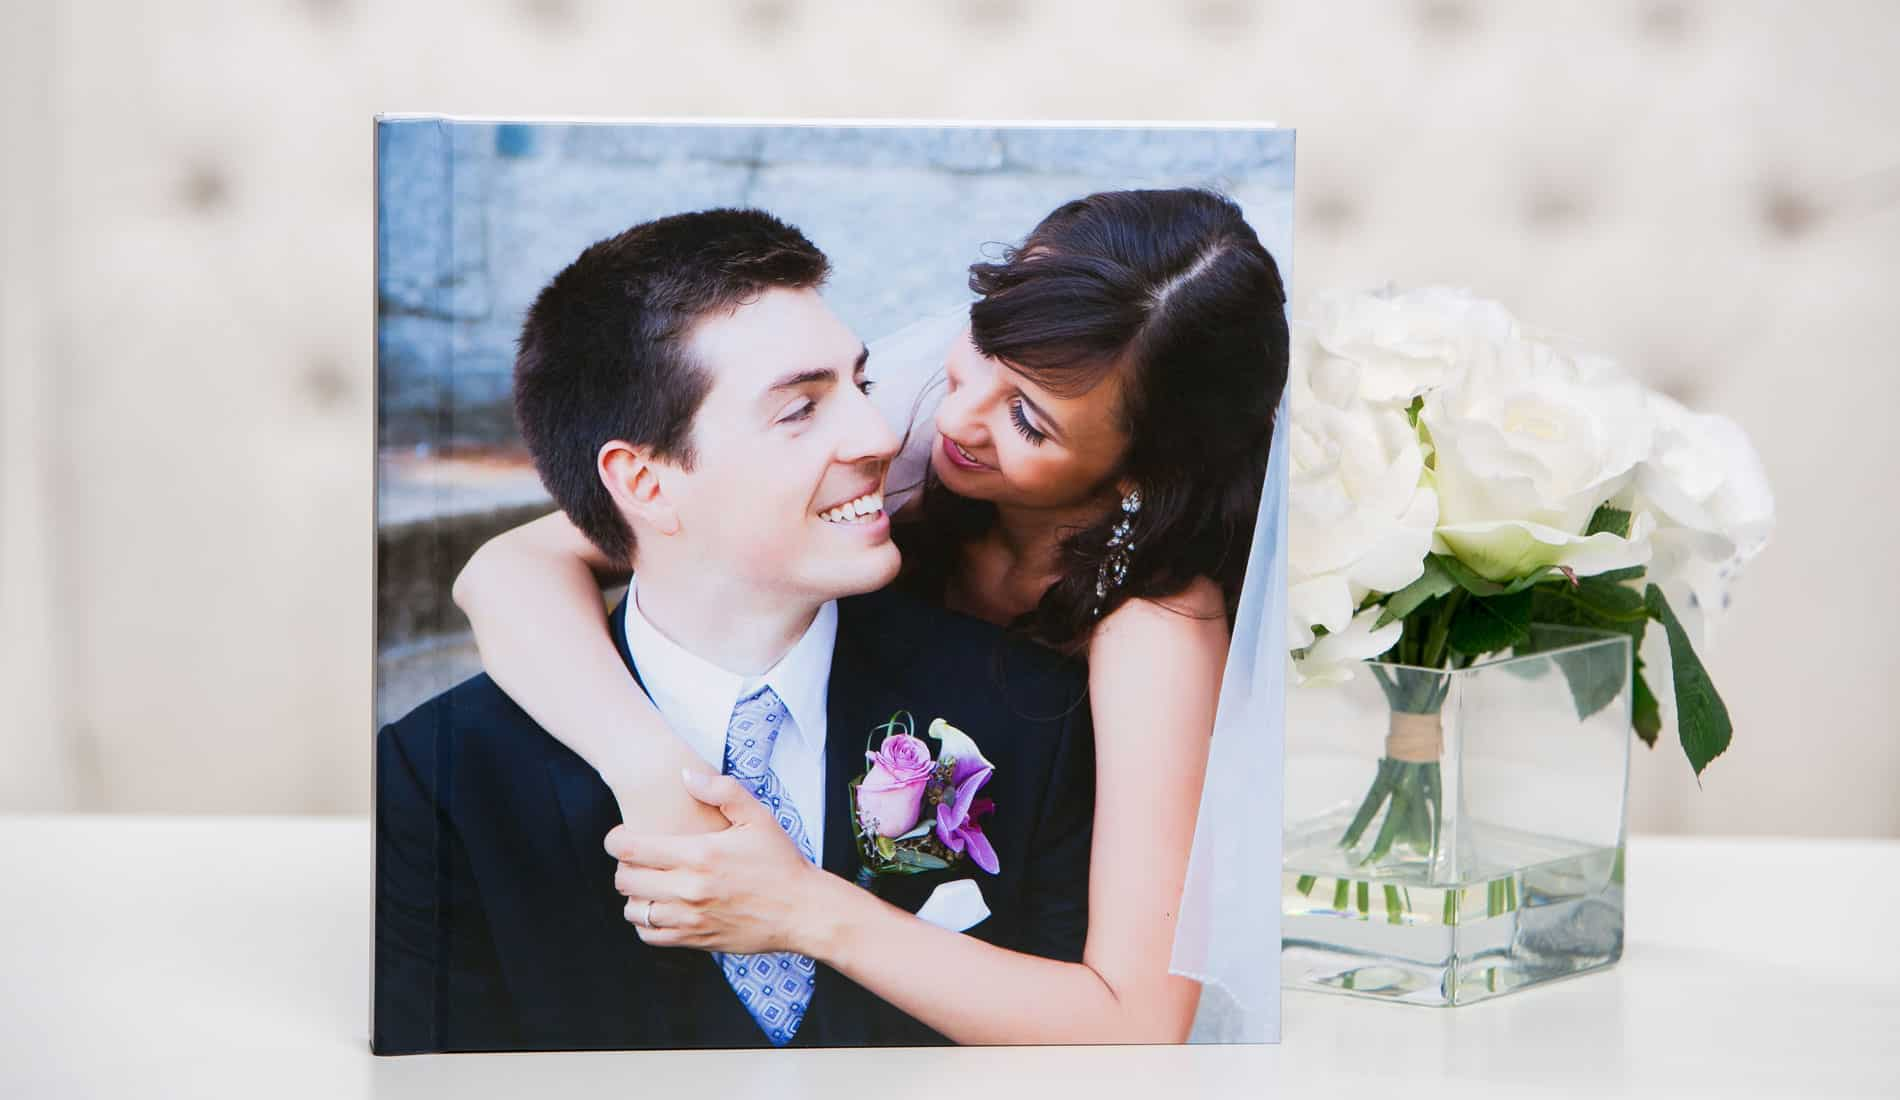 fizara photo wrap wedding album